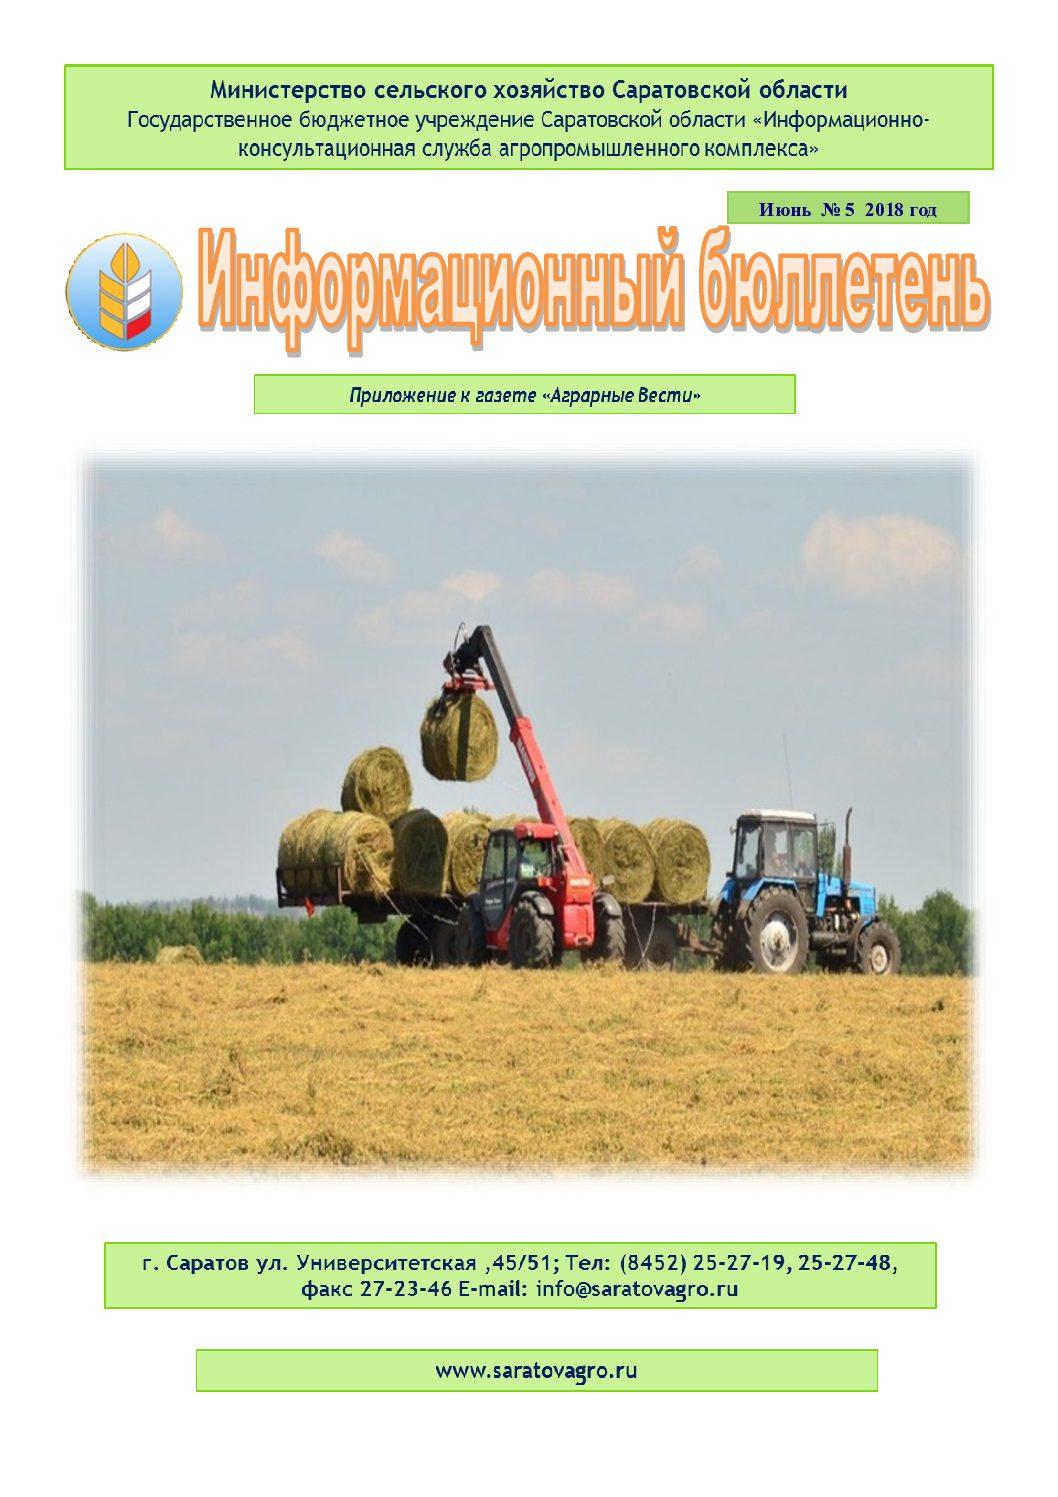 https://saratovagro.ru/wp-content/uploads/2020/08/5.2018-1-pdf.jpg